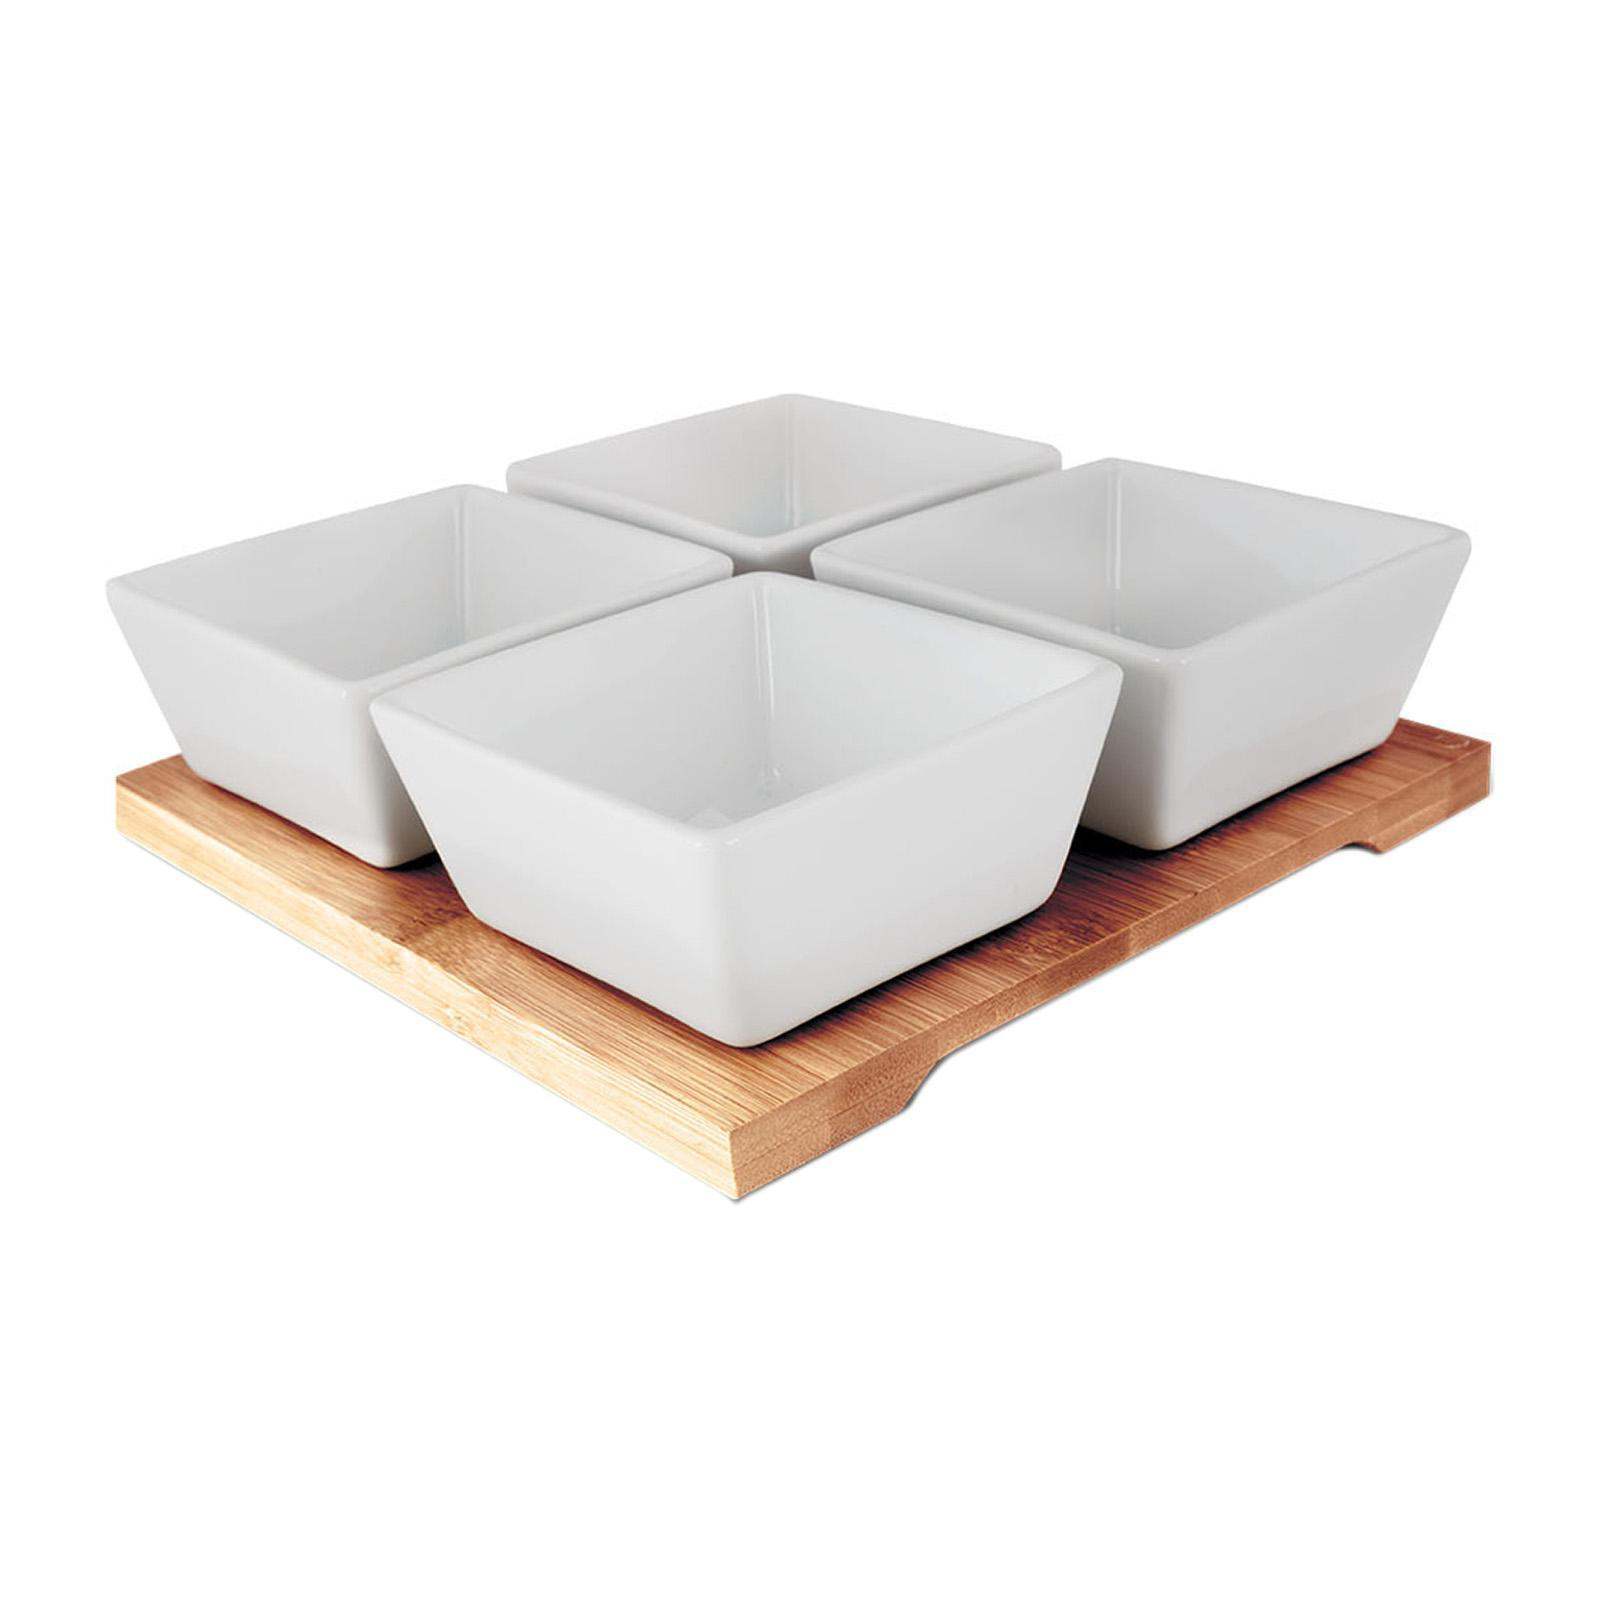 Lamart Serving Bowls - Porcelain - Bamboo